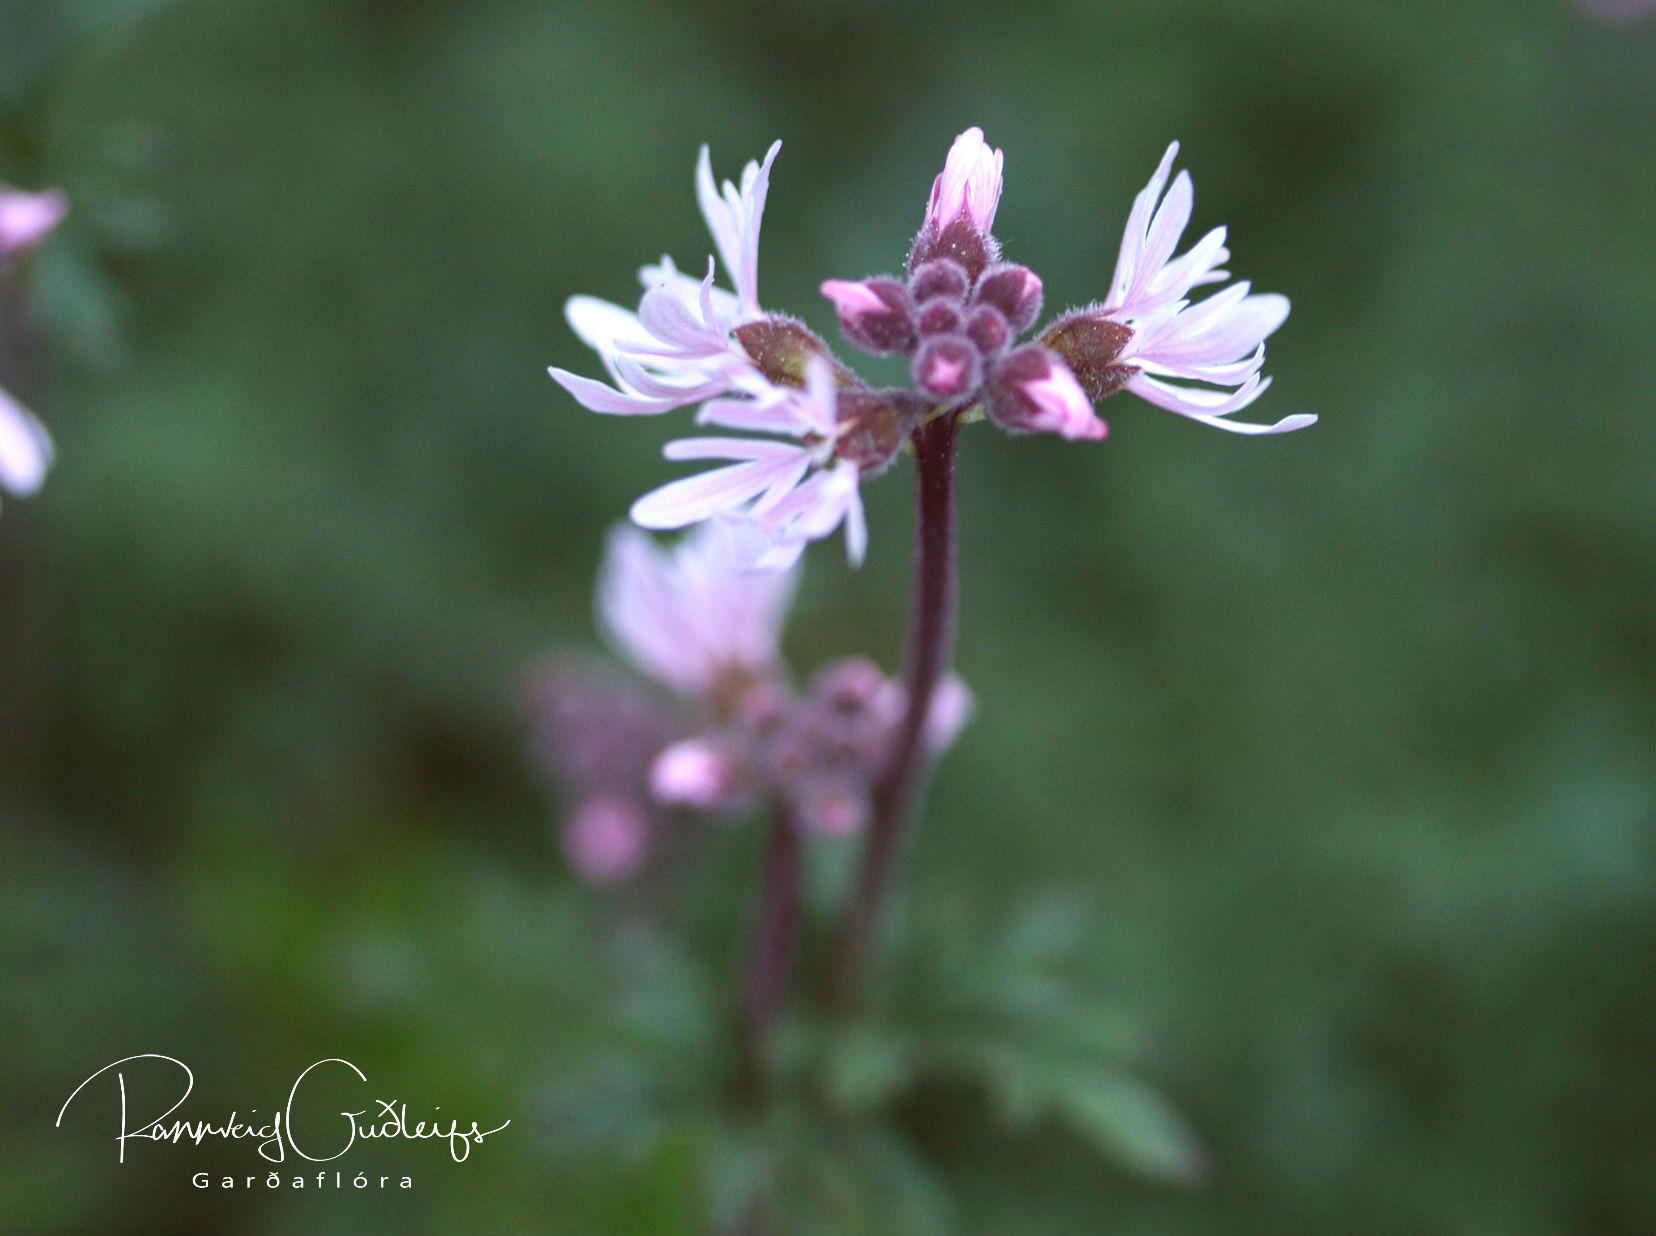 Lithophragma parviflora